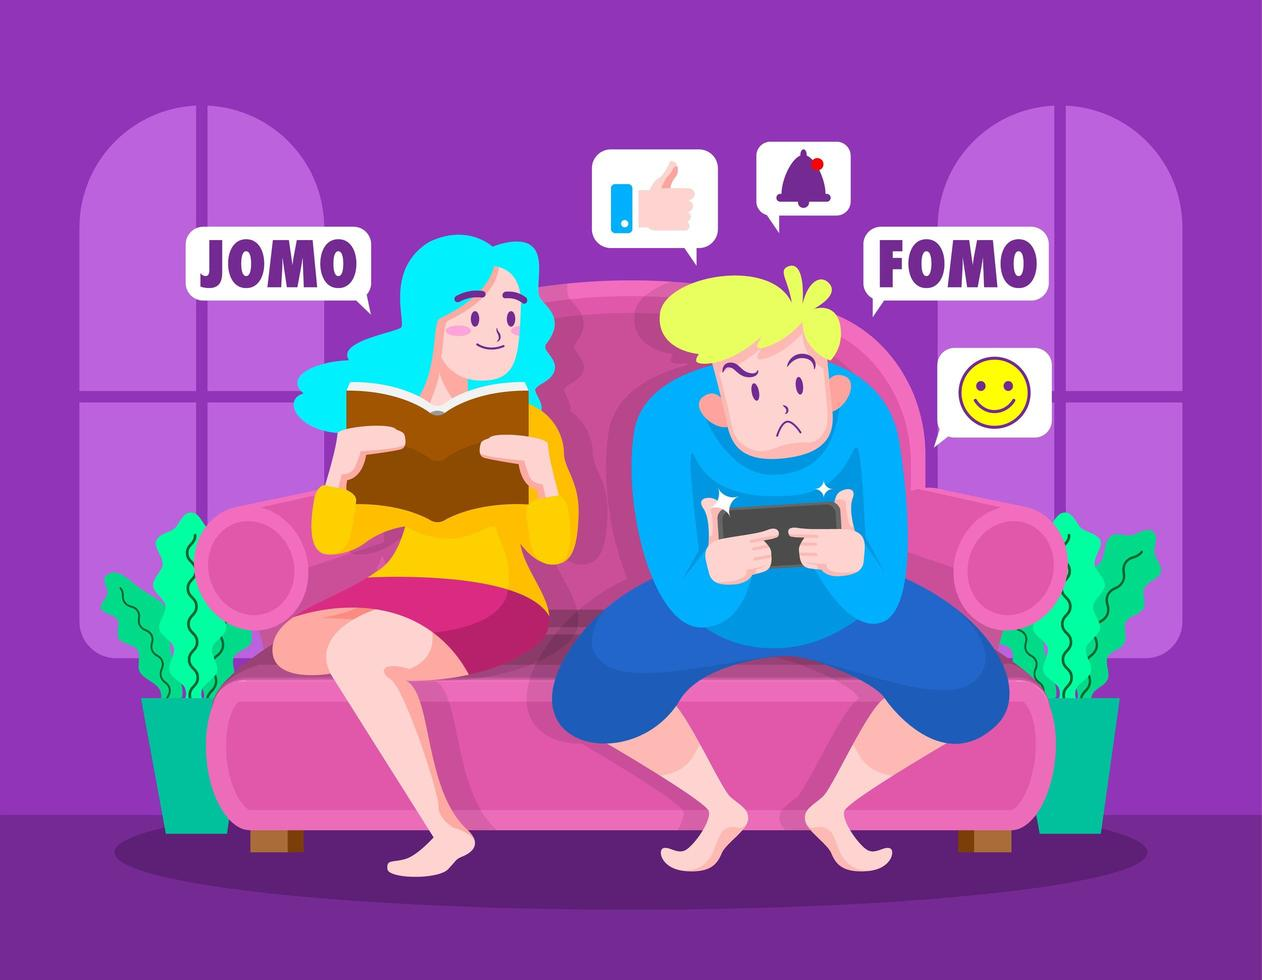 Fomo Vs Jomo Illustrations vector